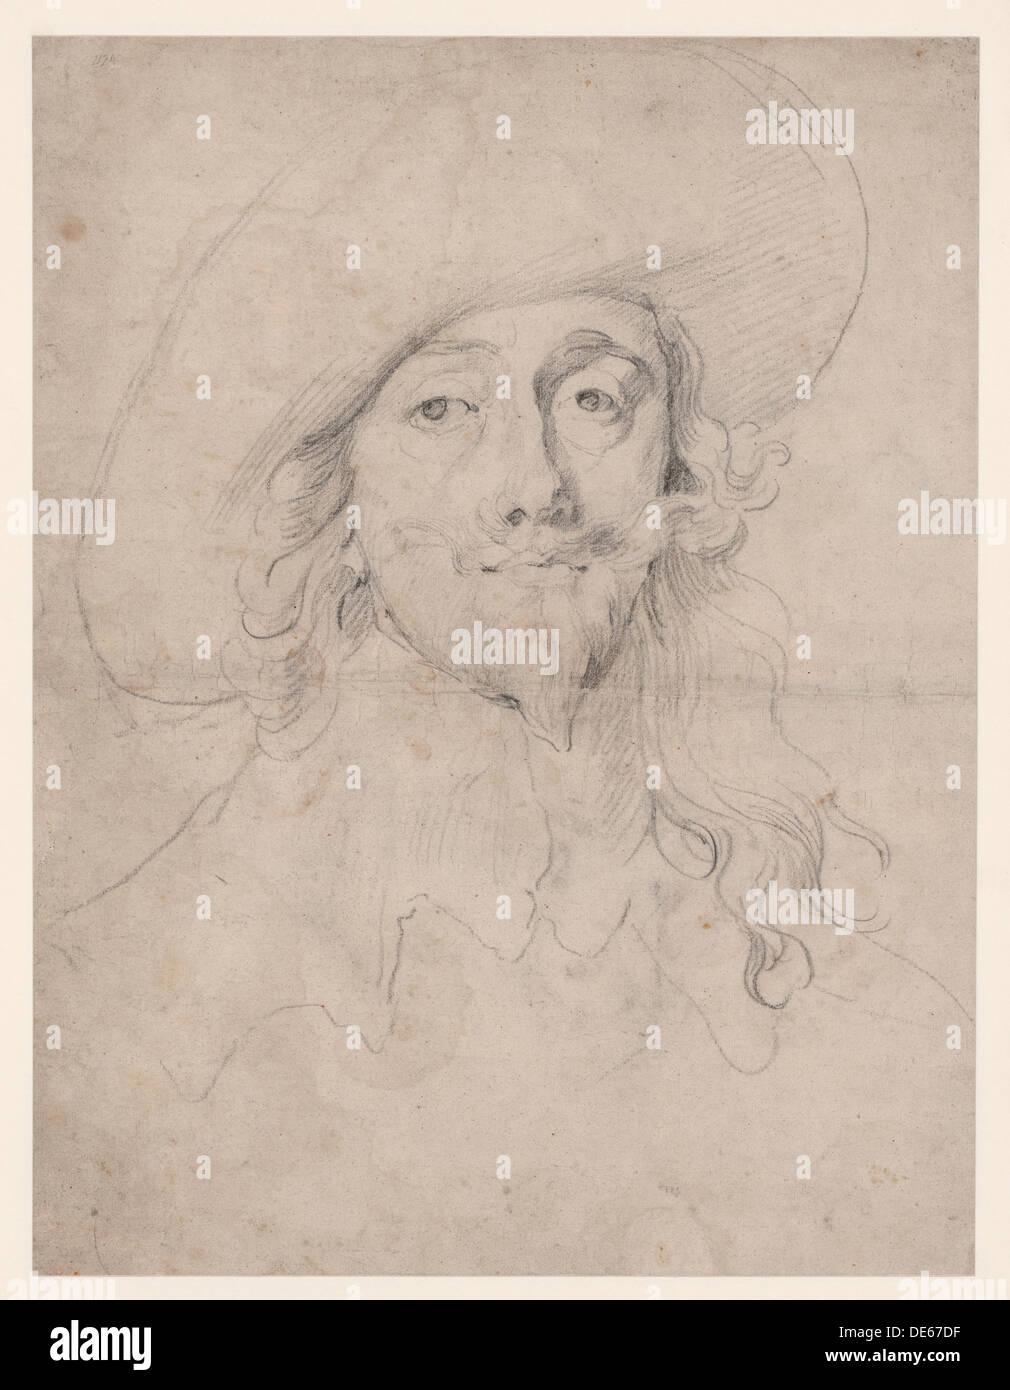 Charles I, King of England  (1600-1649), 1631-1635. Artist: Dyck, Sir Anthonis, van (1599-1641) - Stock Image